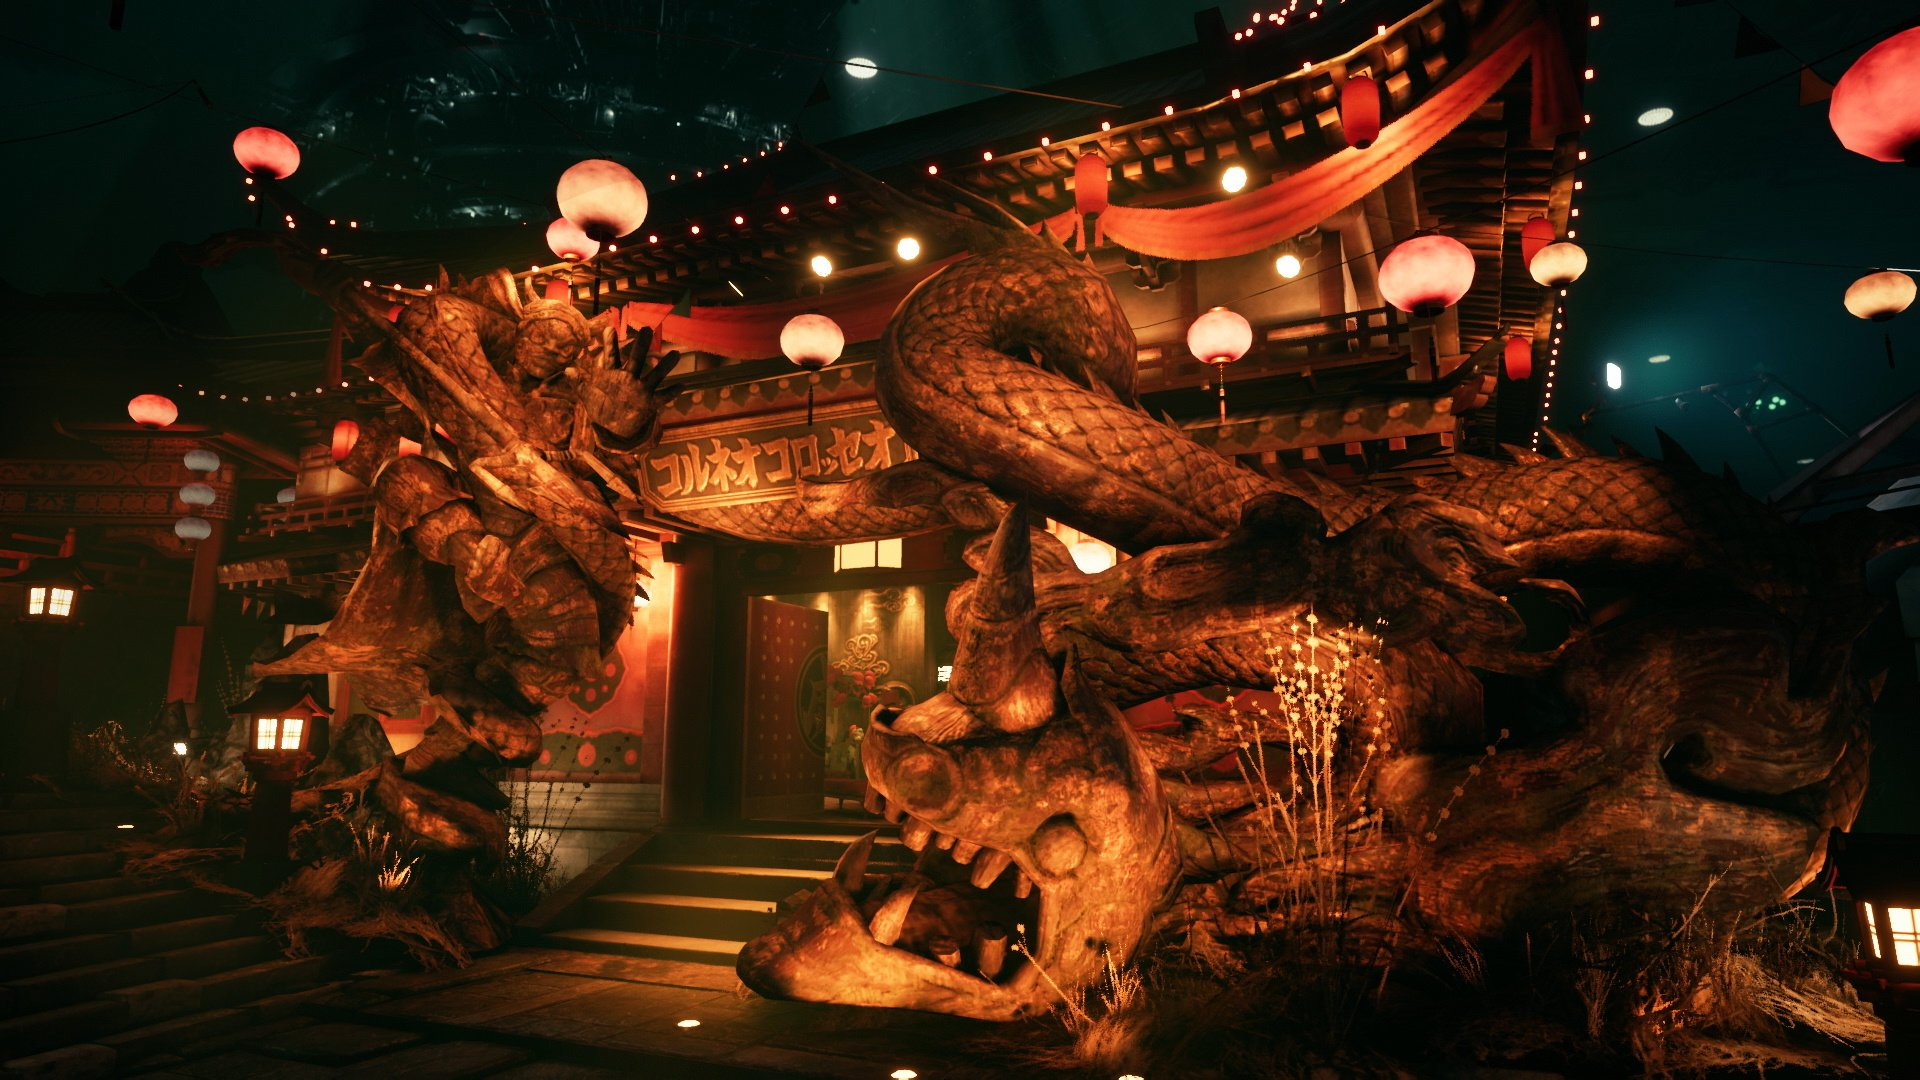 Final fantasy VII REMAKE Shares Information regarding physical release